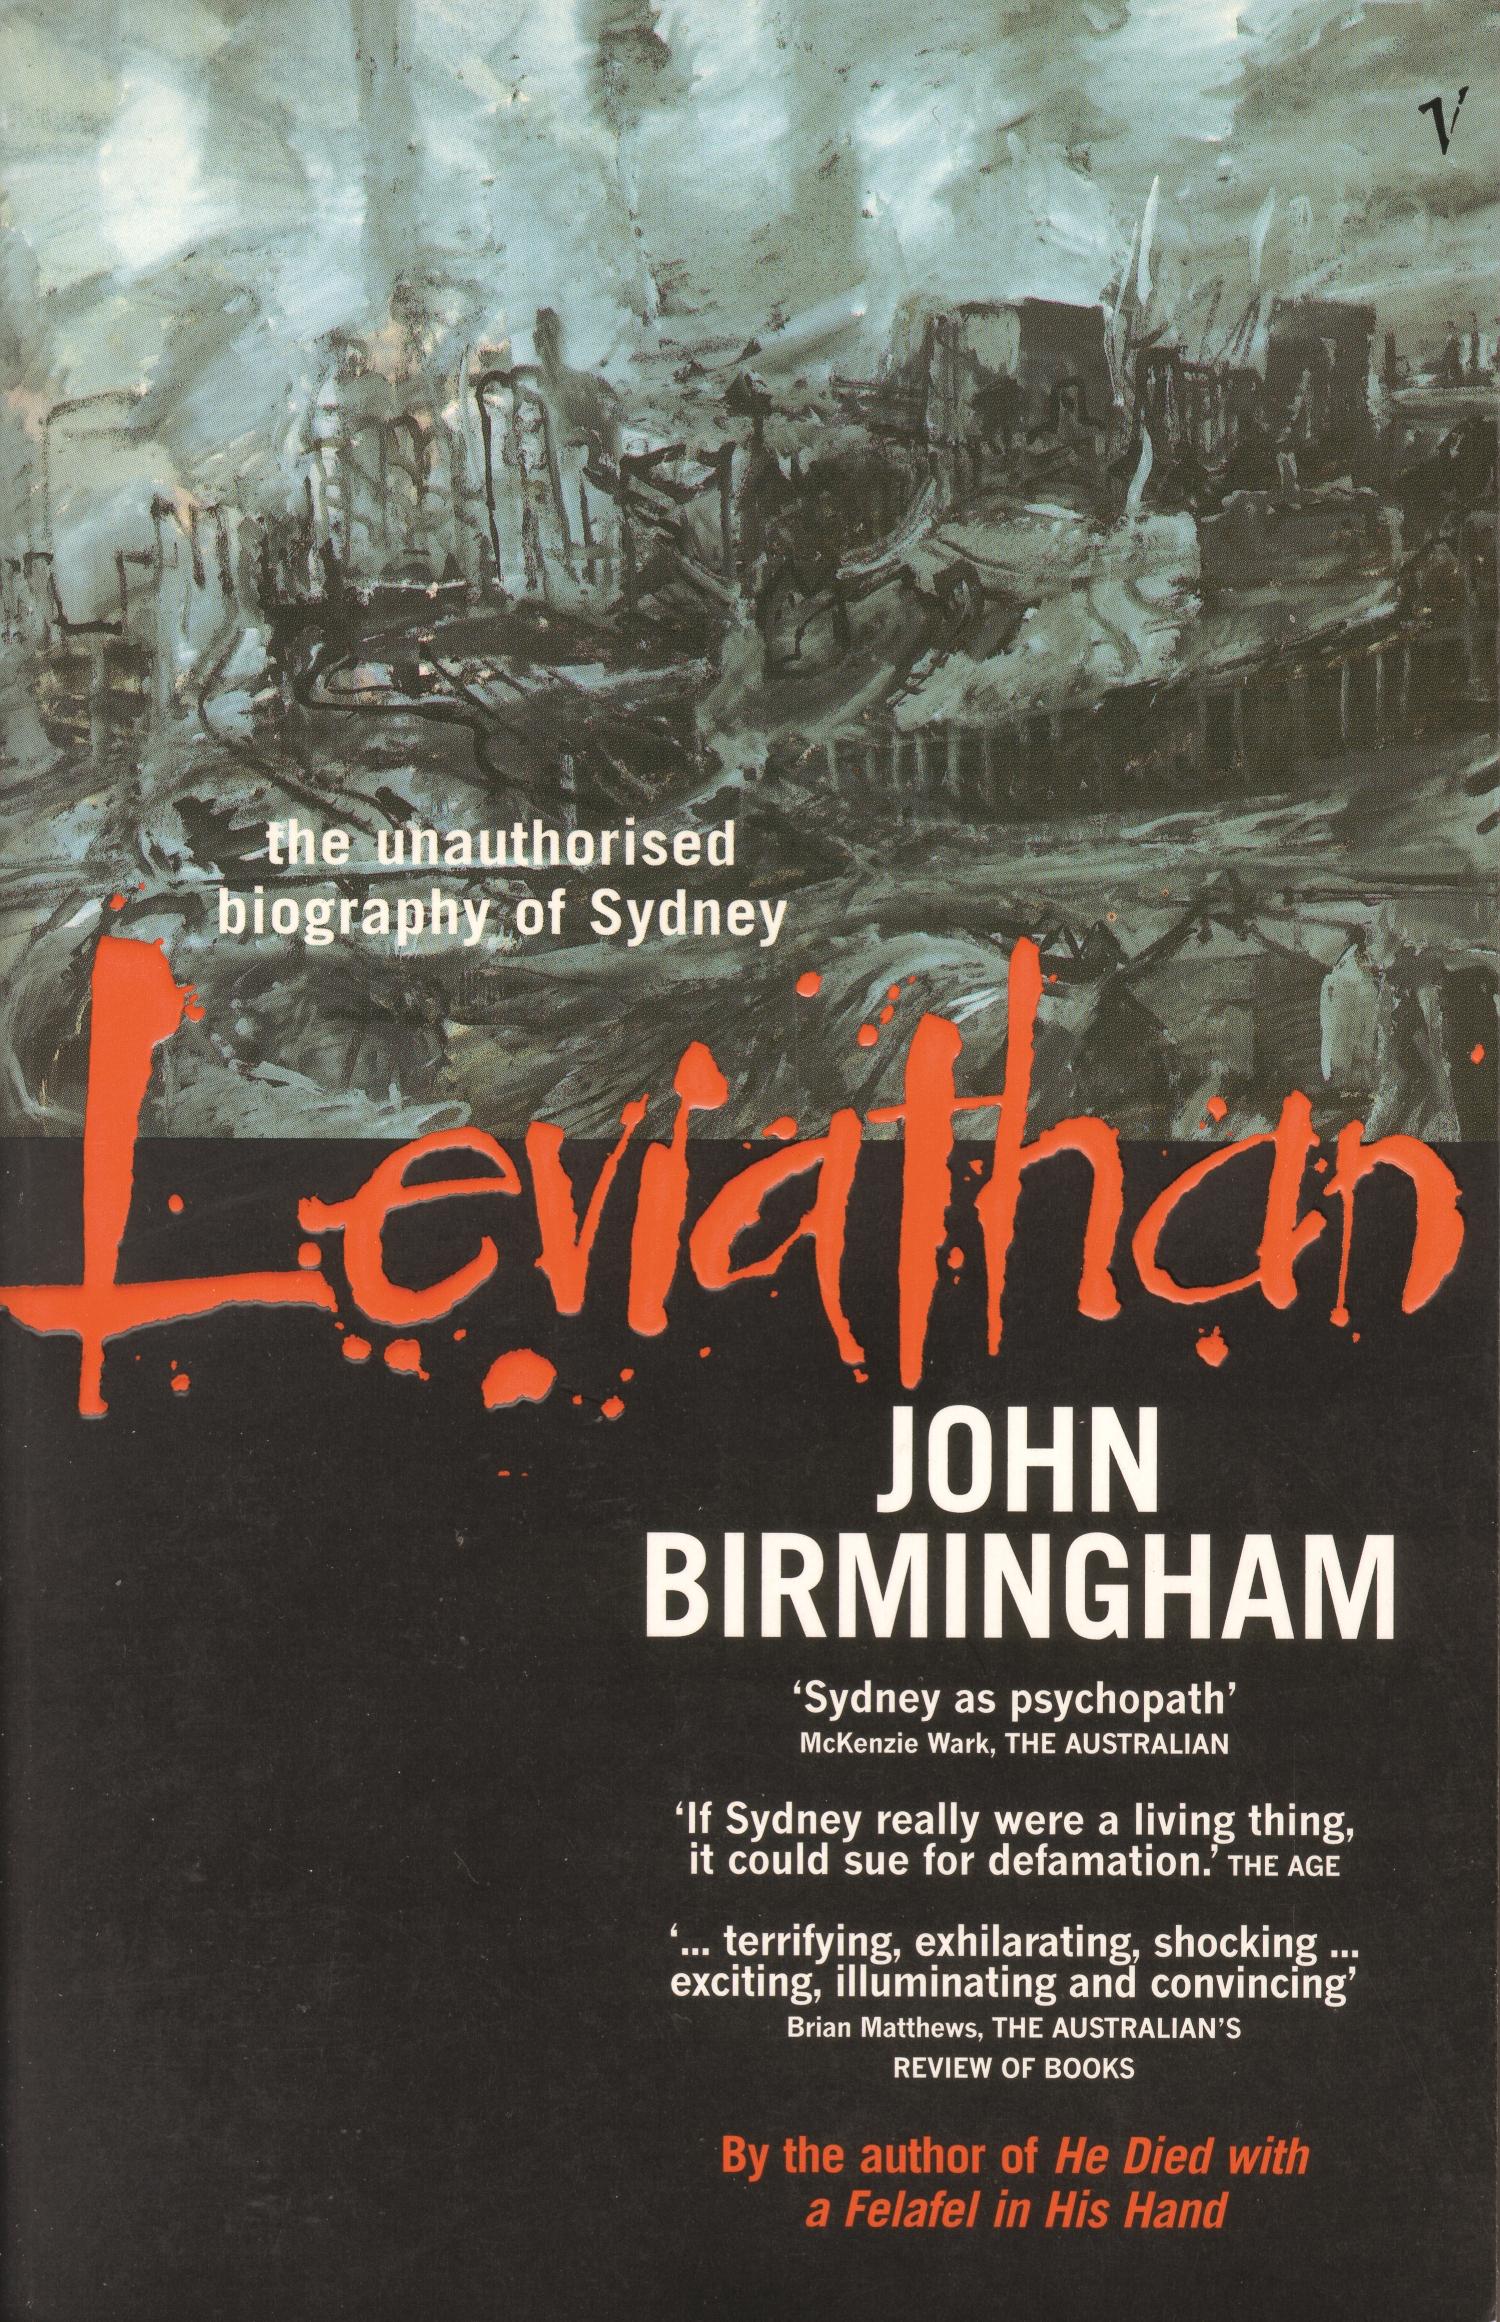 Leviathan by John Birmingham - Penguin Books Australia